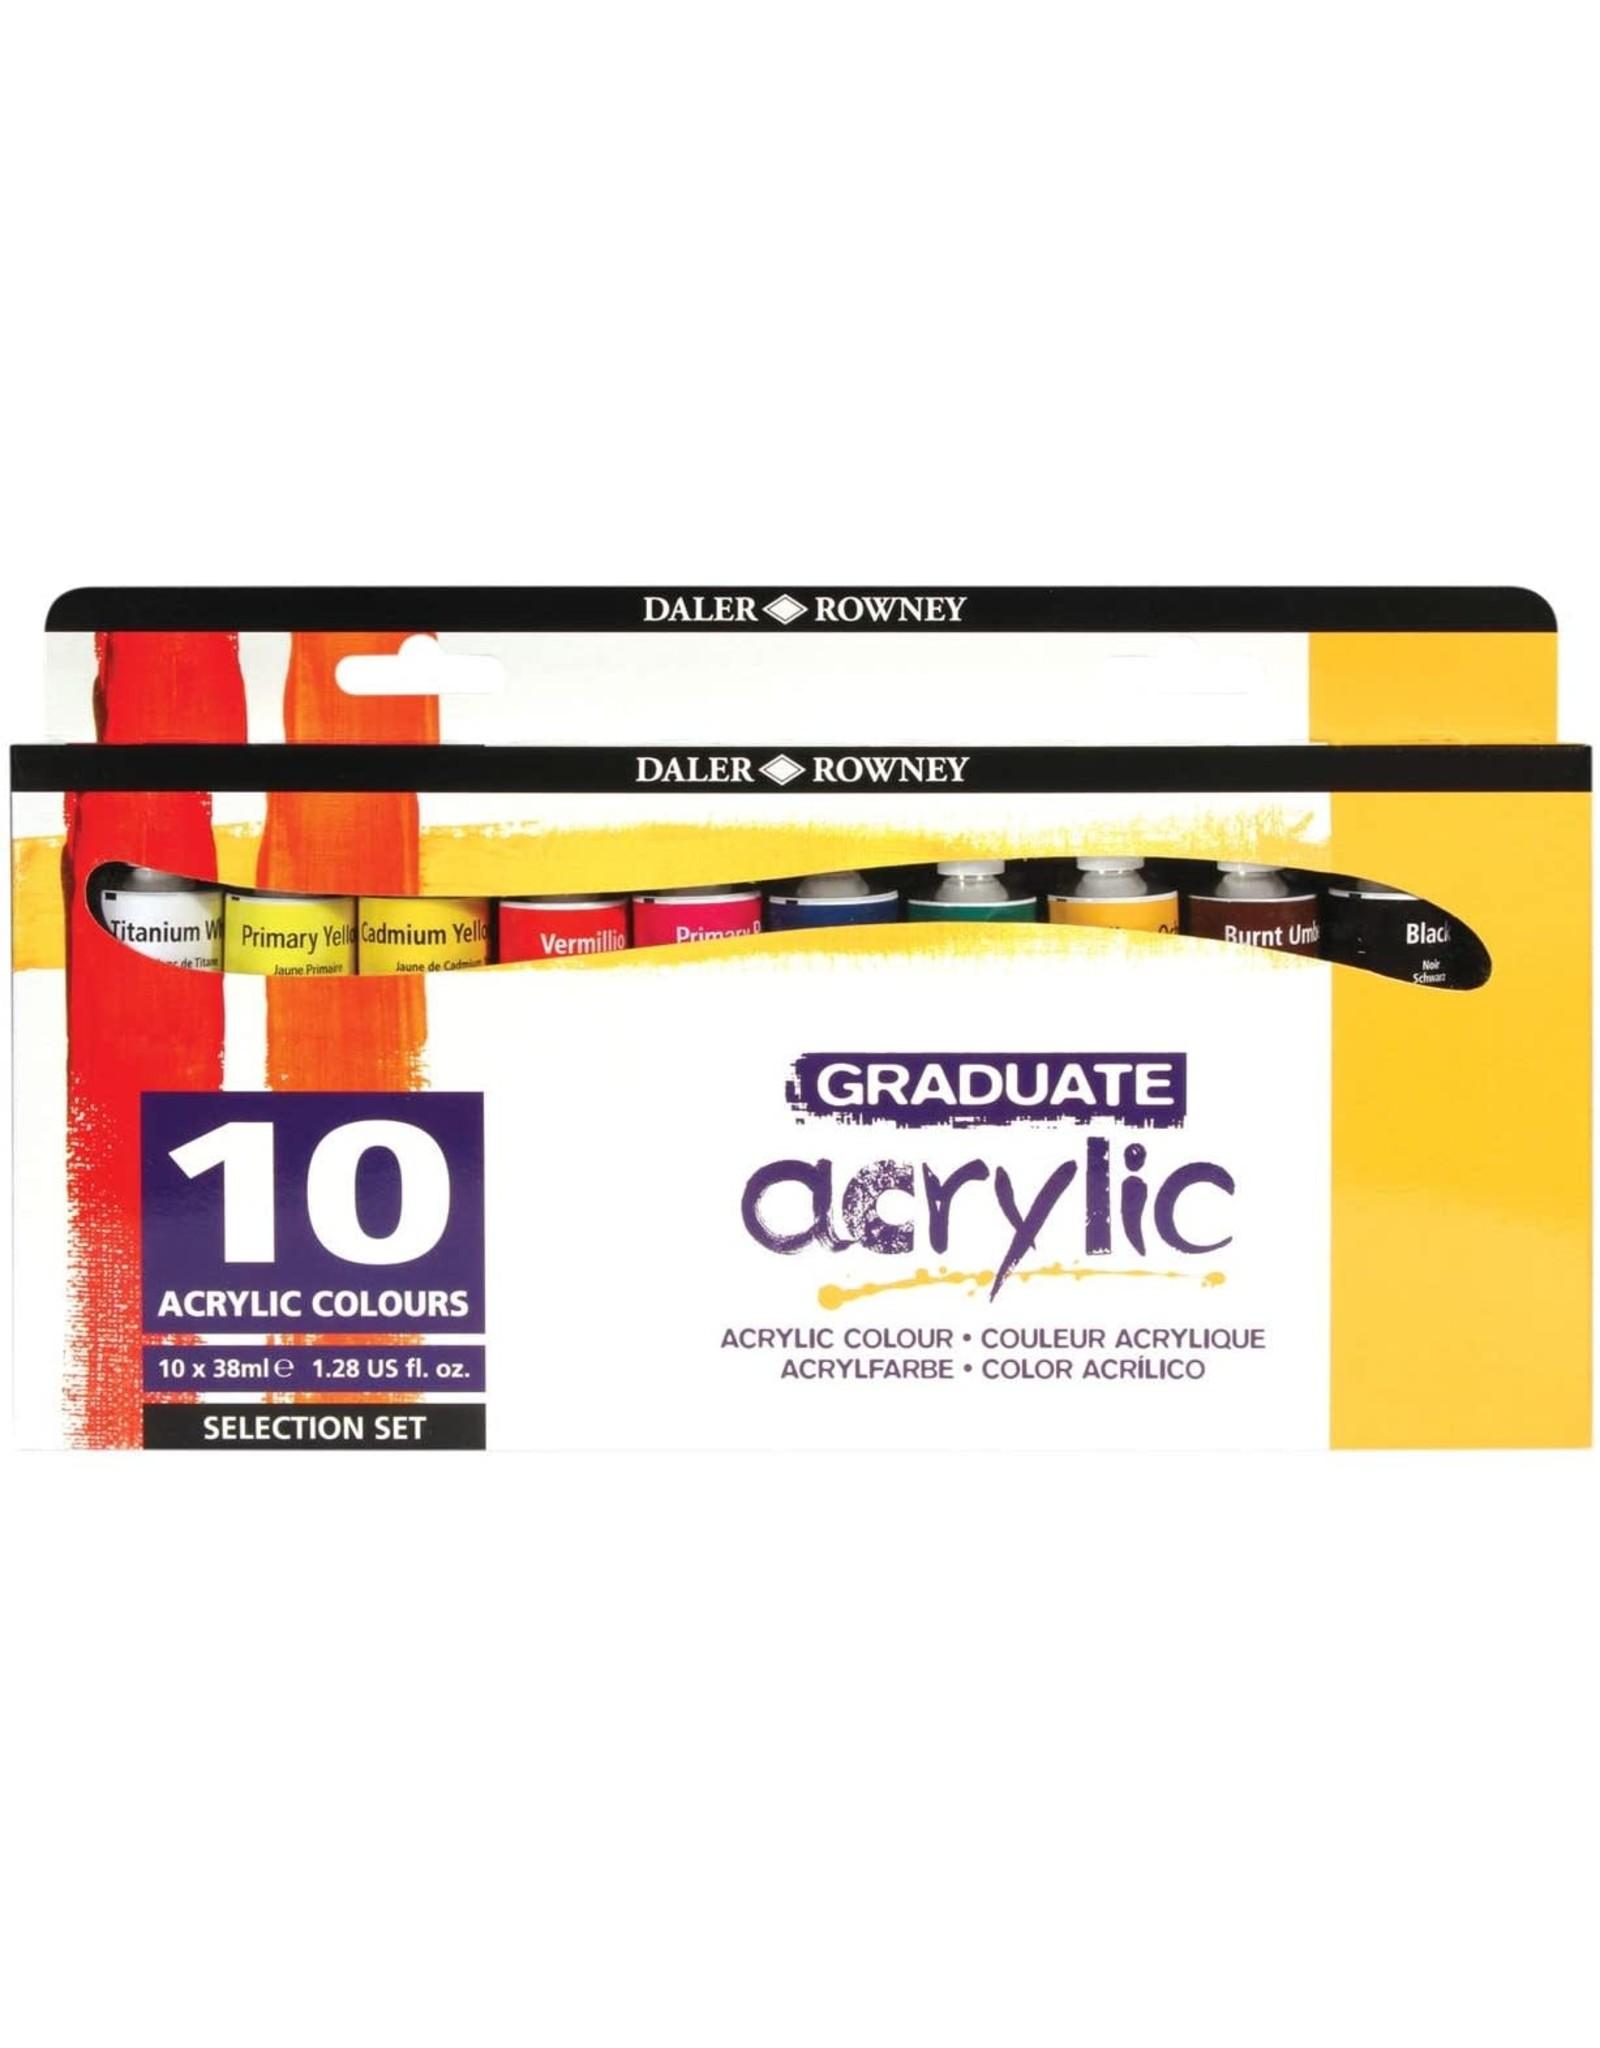 Daler Rowney Graduate Acrylic Intro Set 10x38ml